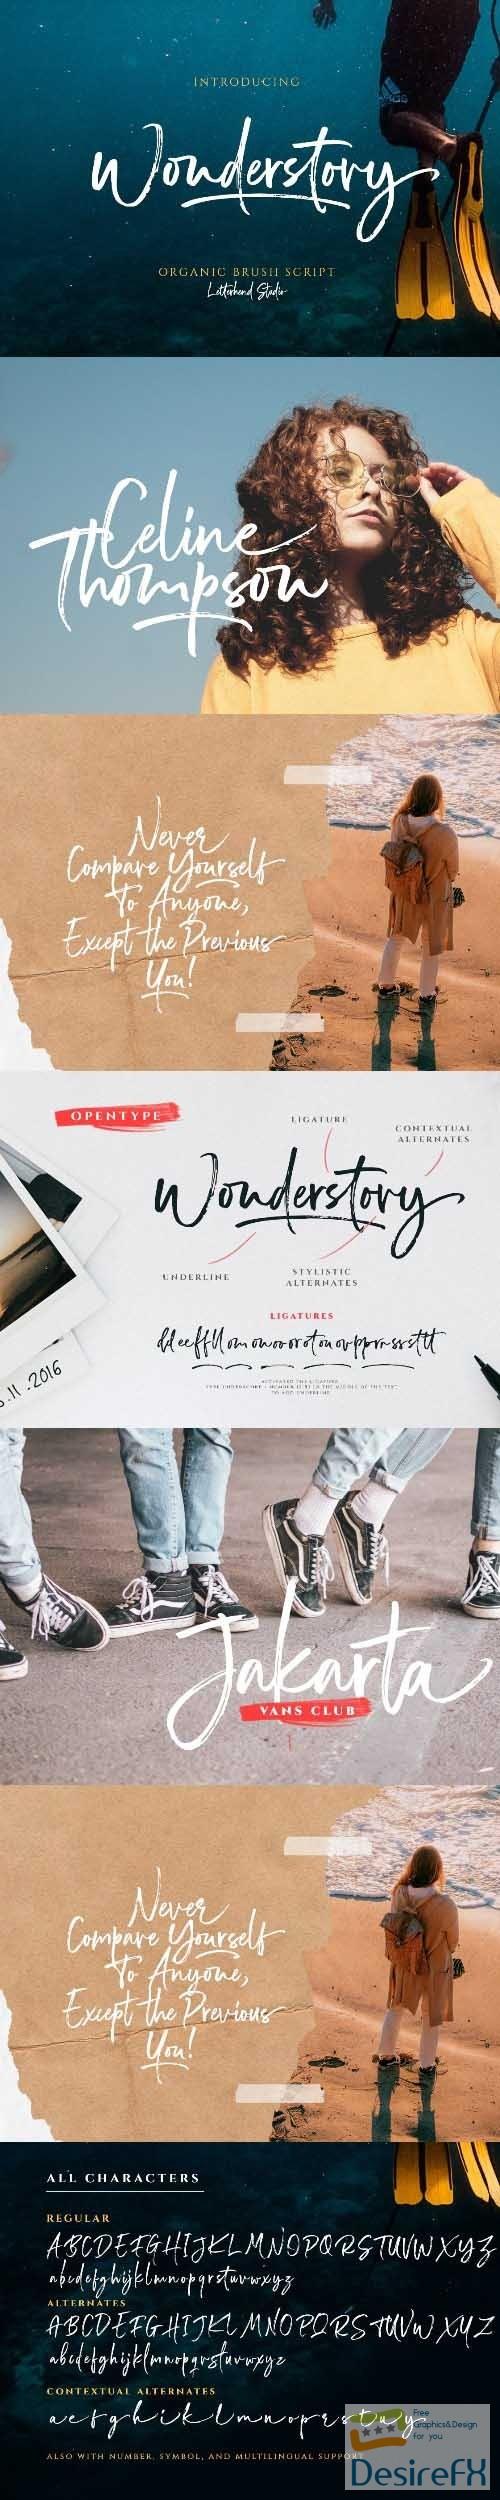 fonts - Wonderstory - Brush Script